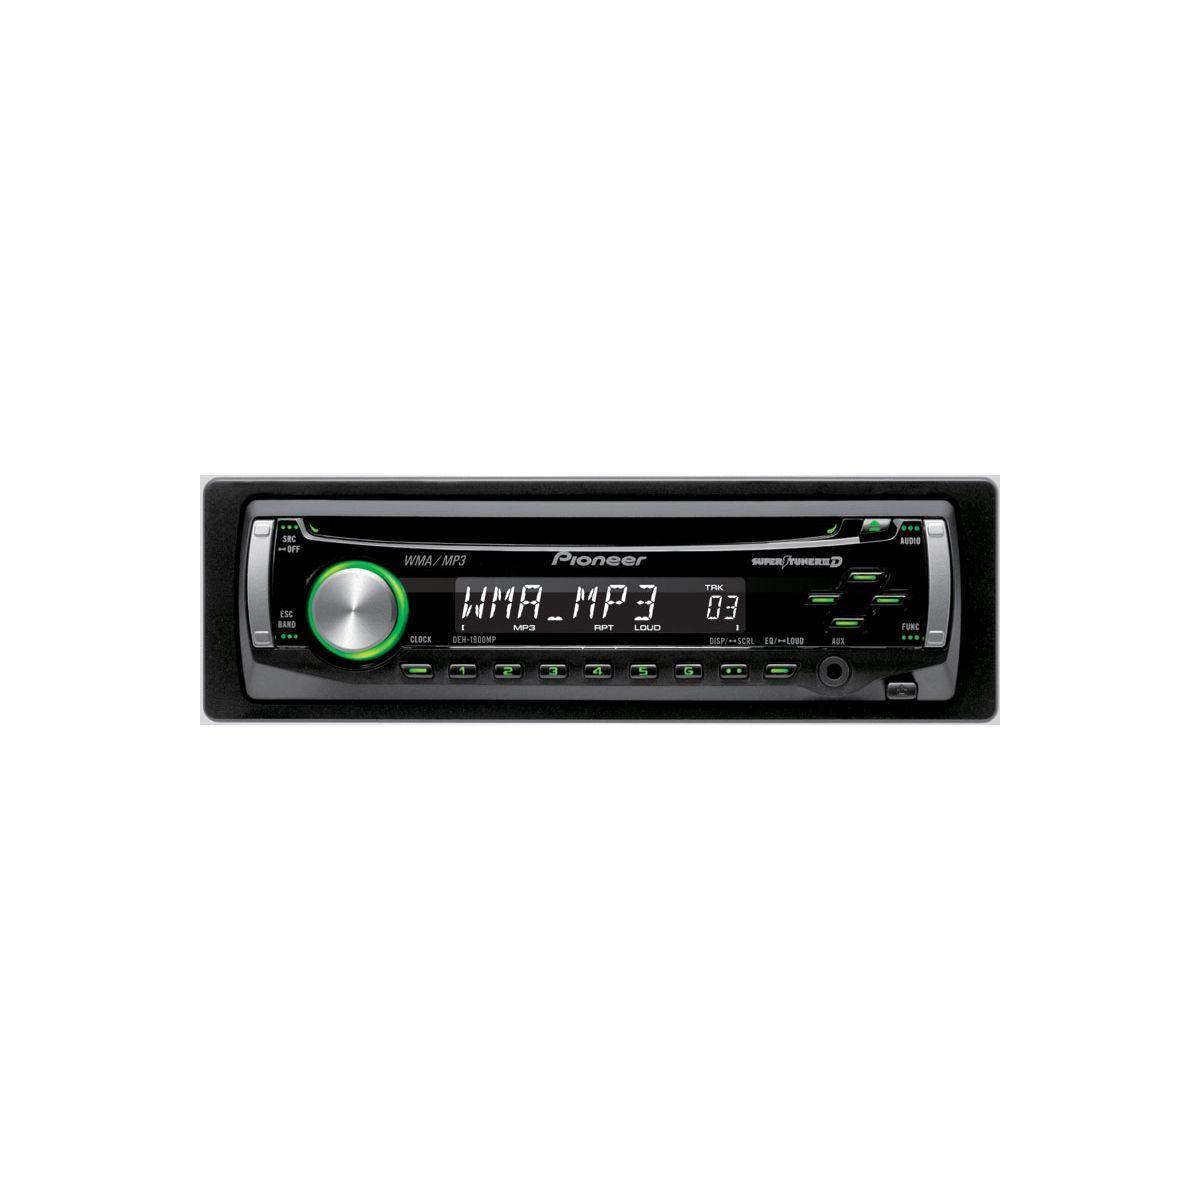 Auto-radio pioneer deh-1900ub - livraison offerte : code livre...